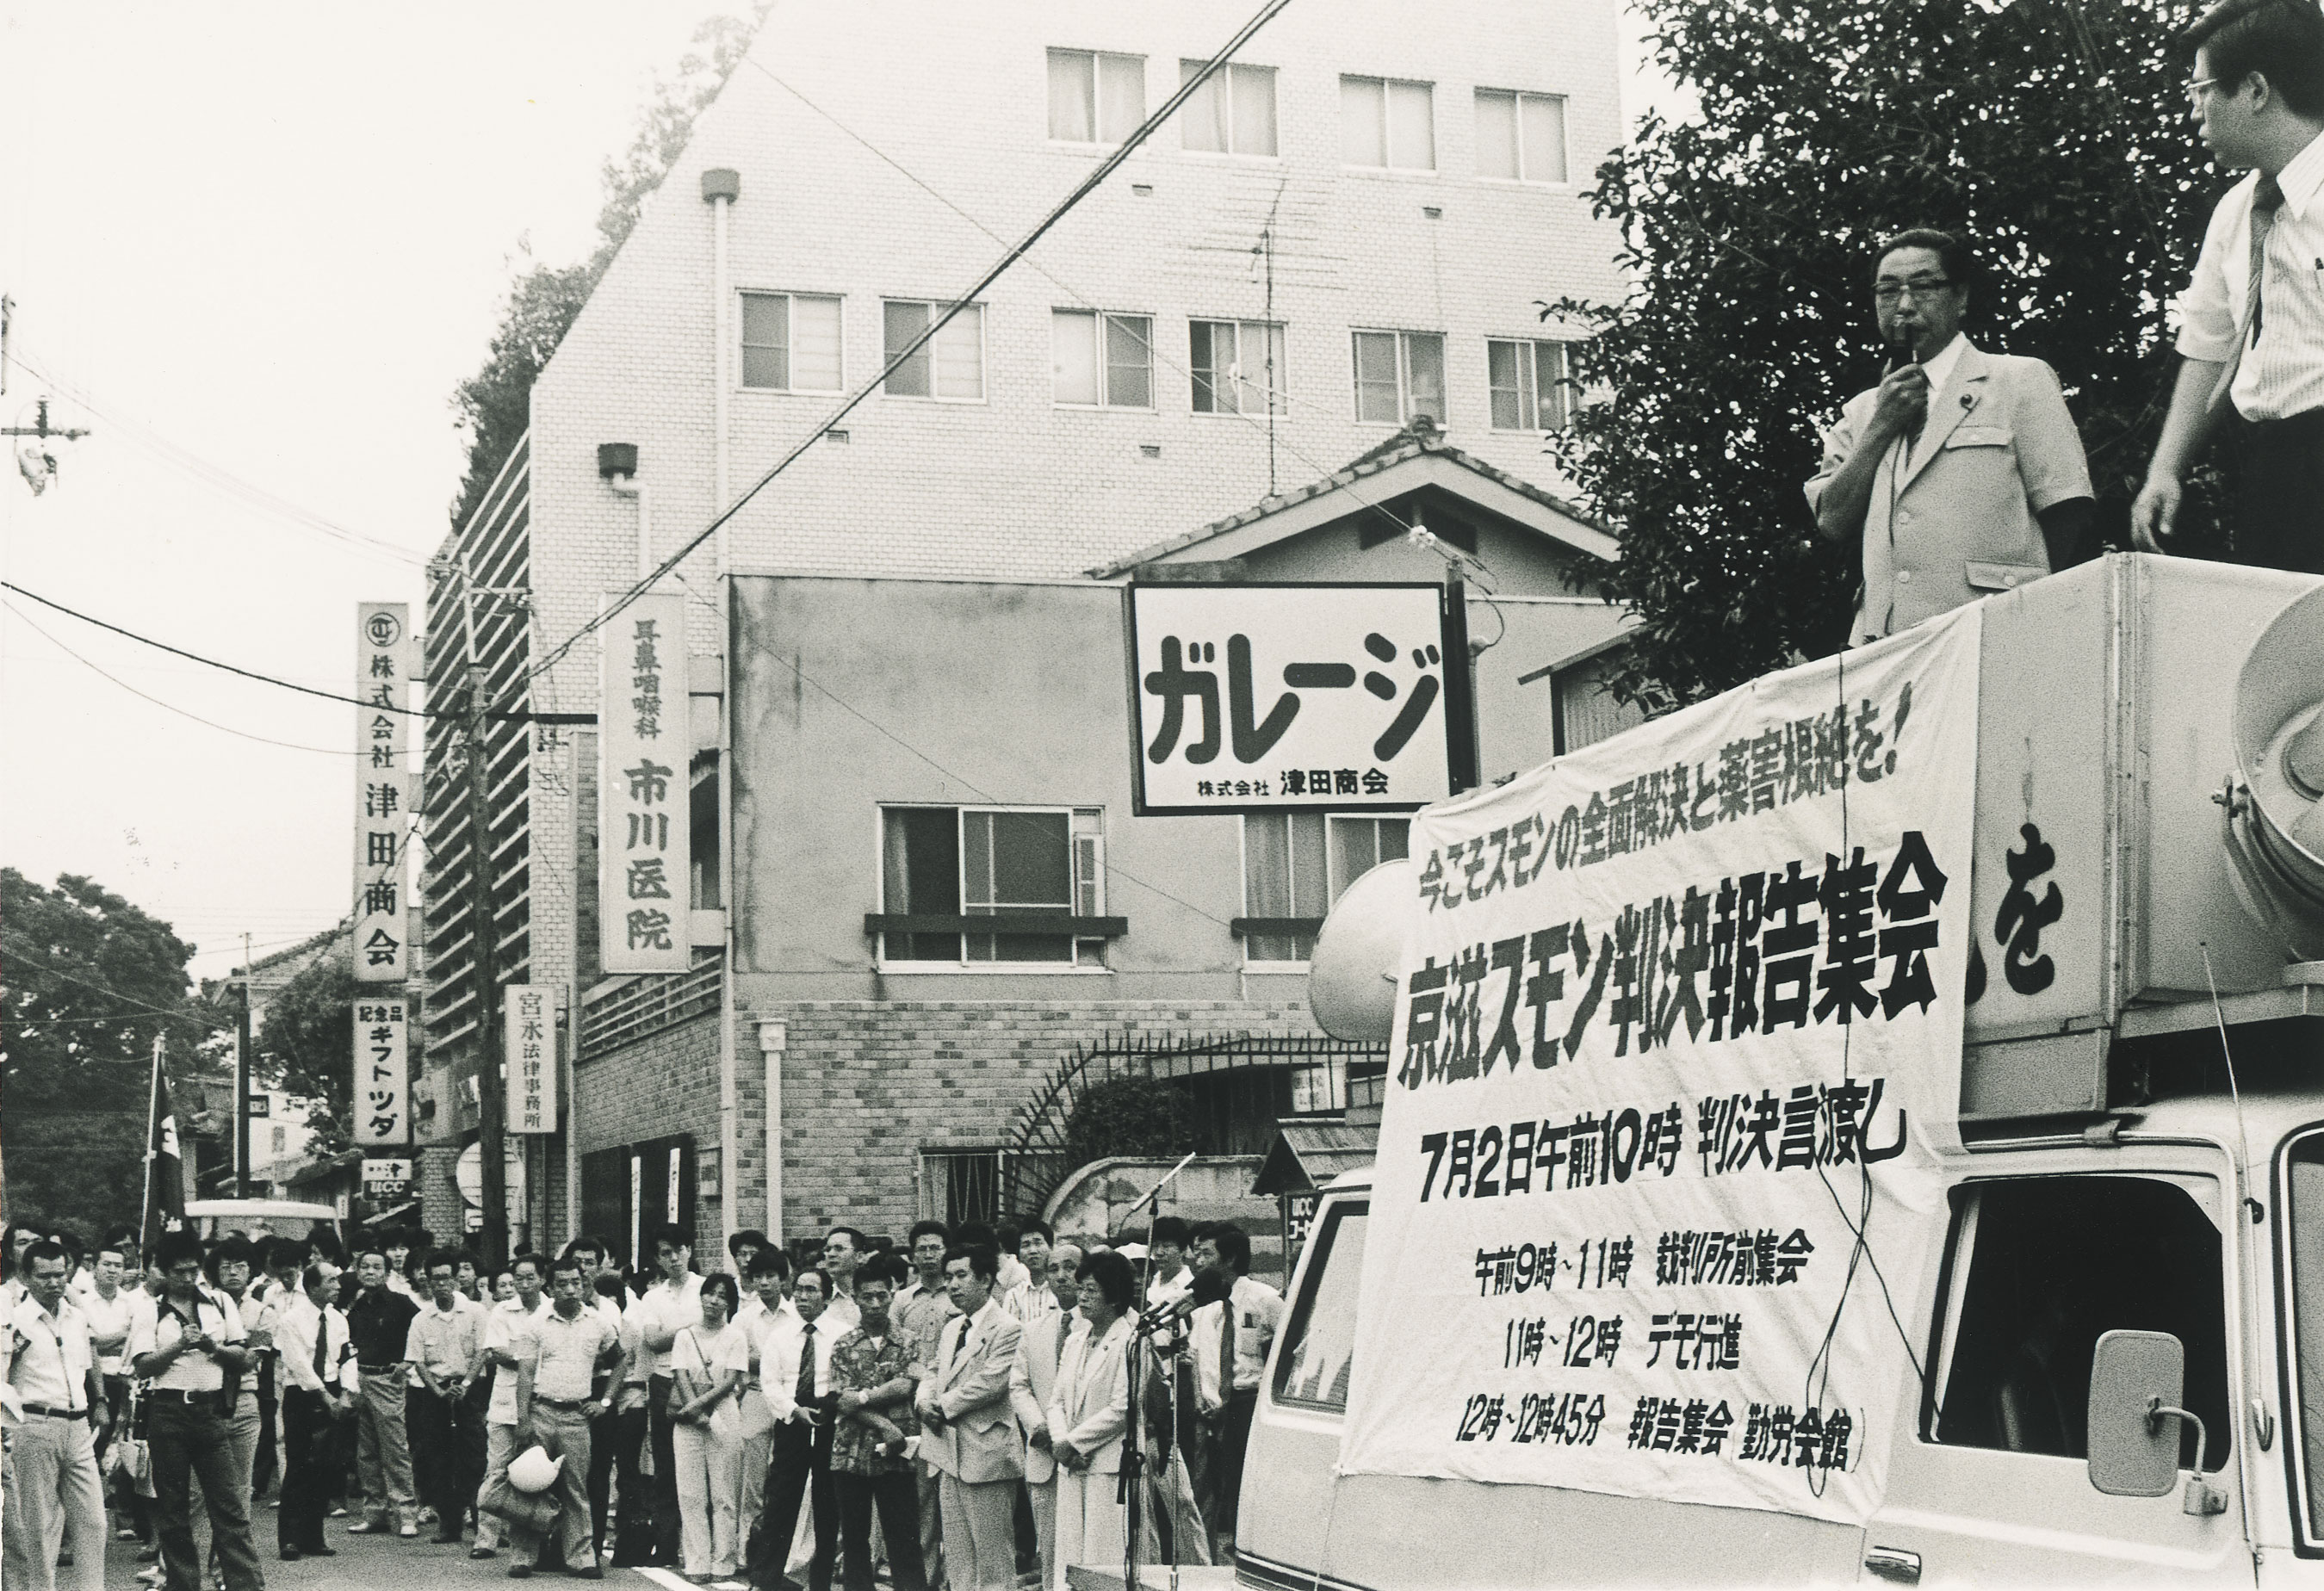 京滋スモン判決報告集会